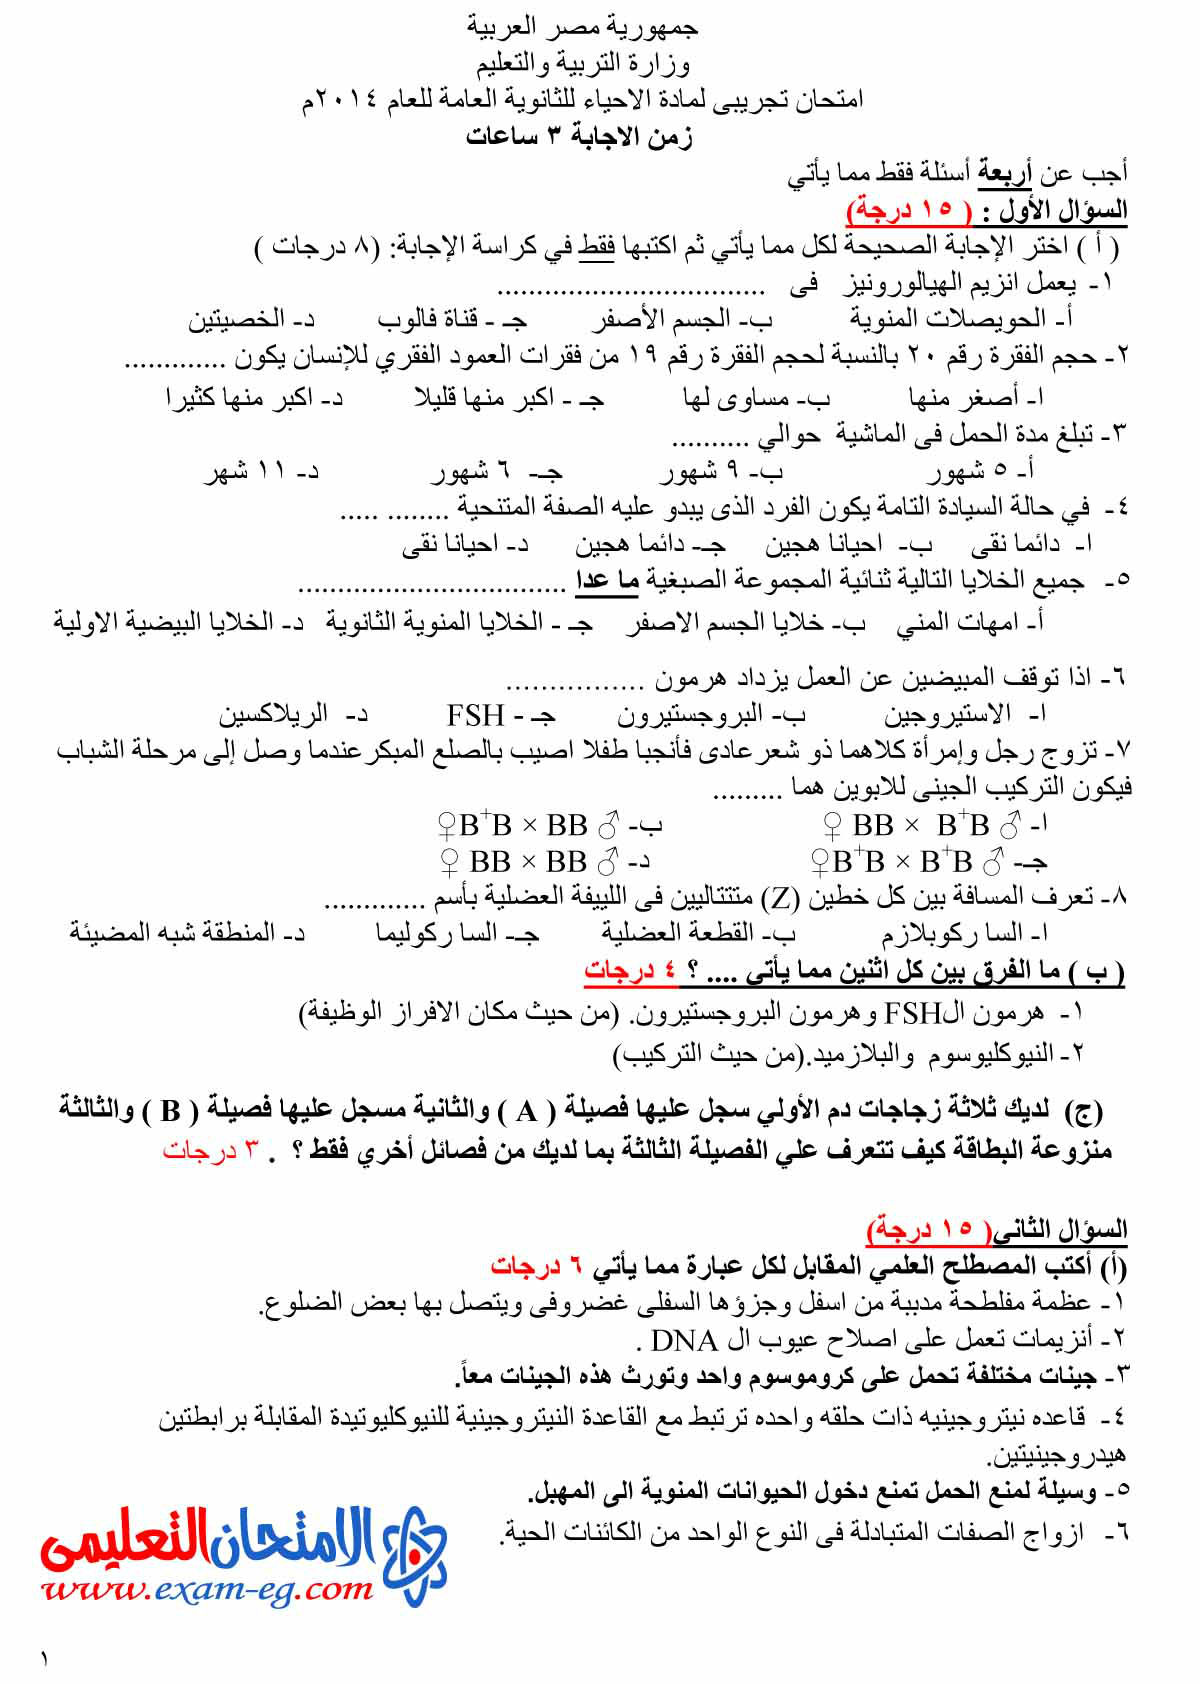 exam-eg.com_1403333593951.jpg